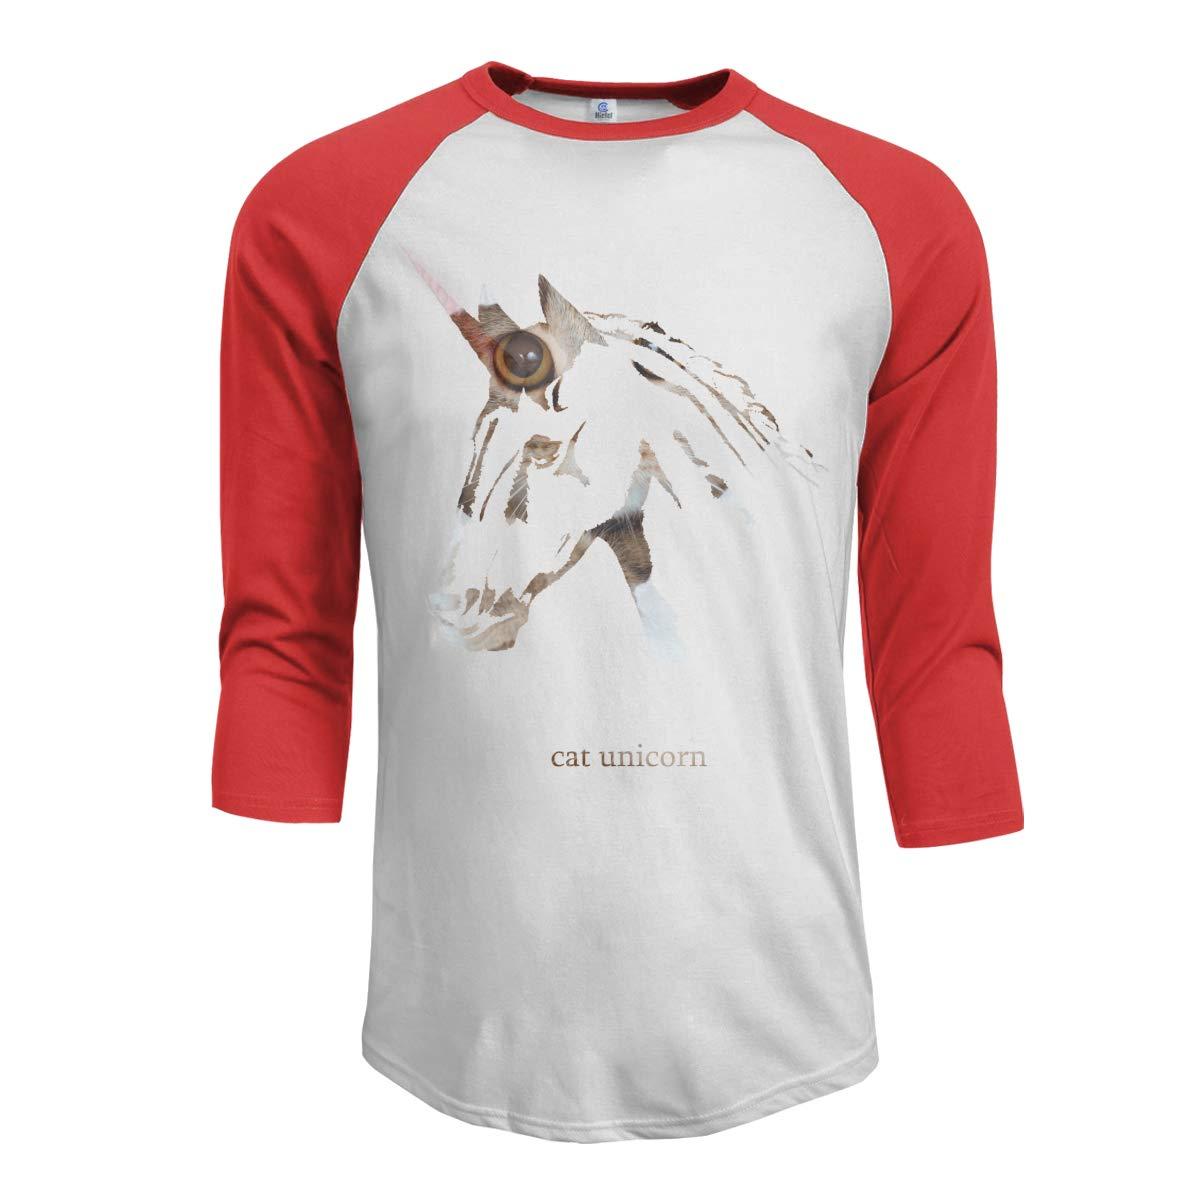 Xusnjv Cro-wn Ro-yal T Shirt Boys and Girls Casual Round Neck Short Sleeve T-Shirts Cotton